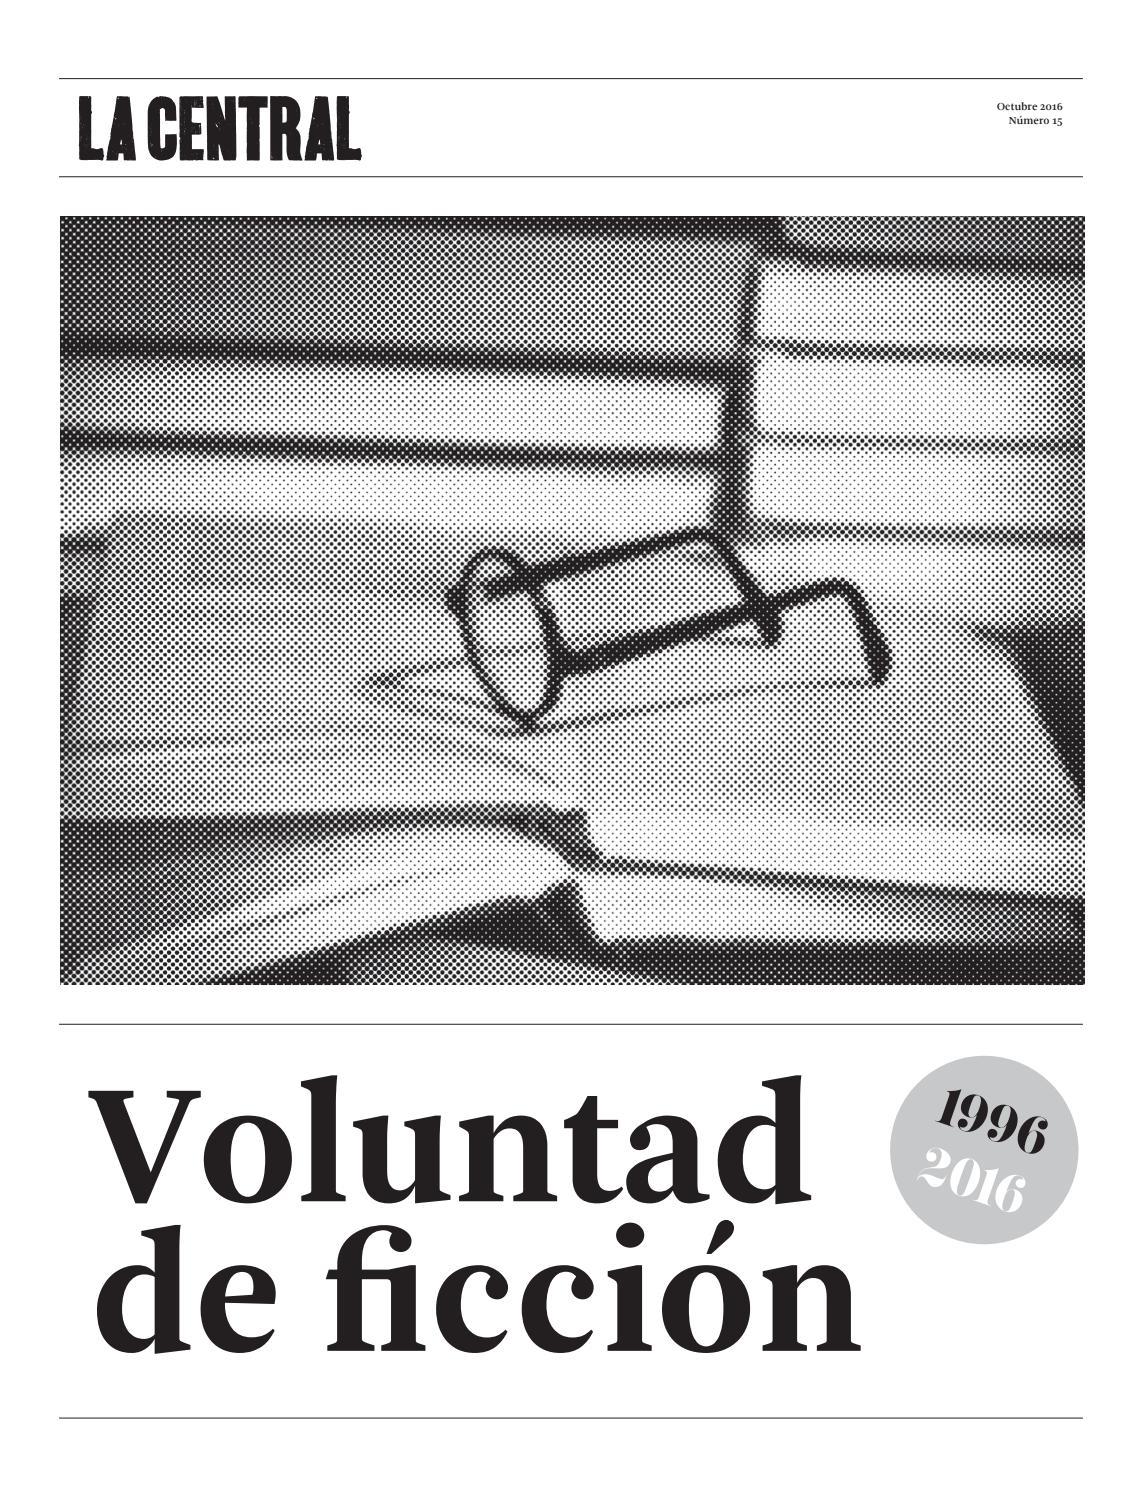 Periódico La Central. Octubre 2016 by webmaster LaCentral - issuu